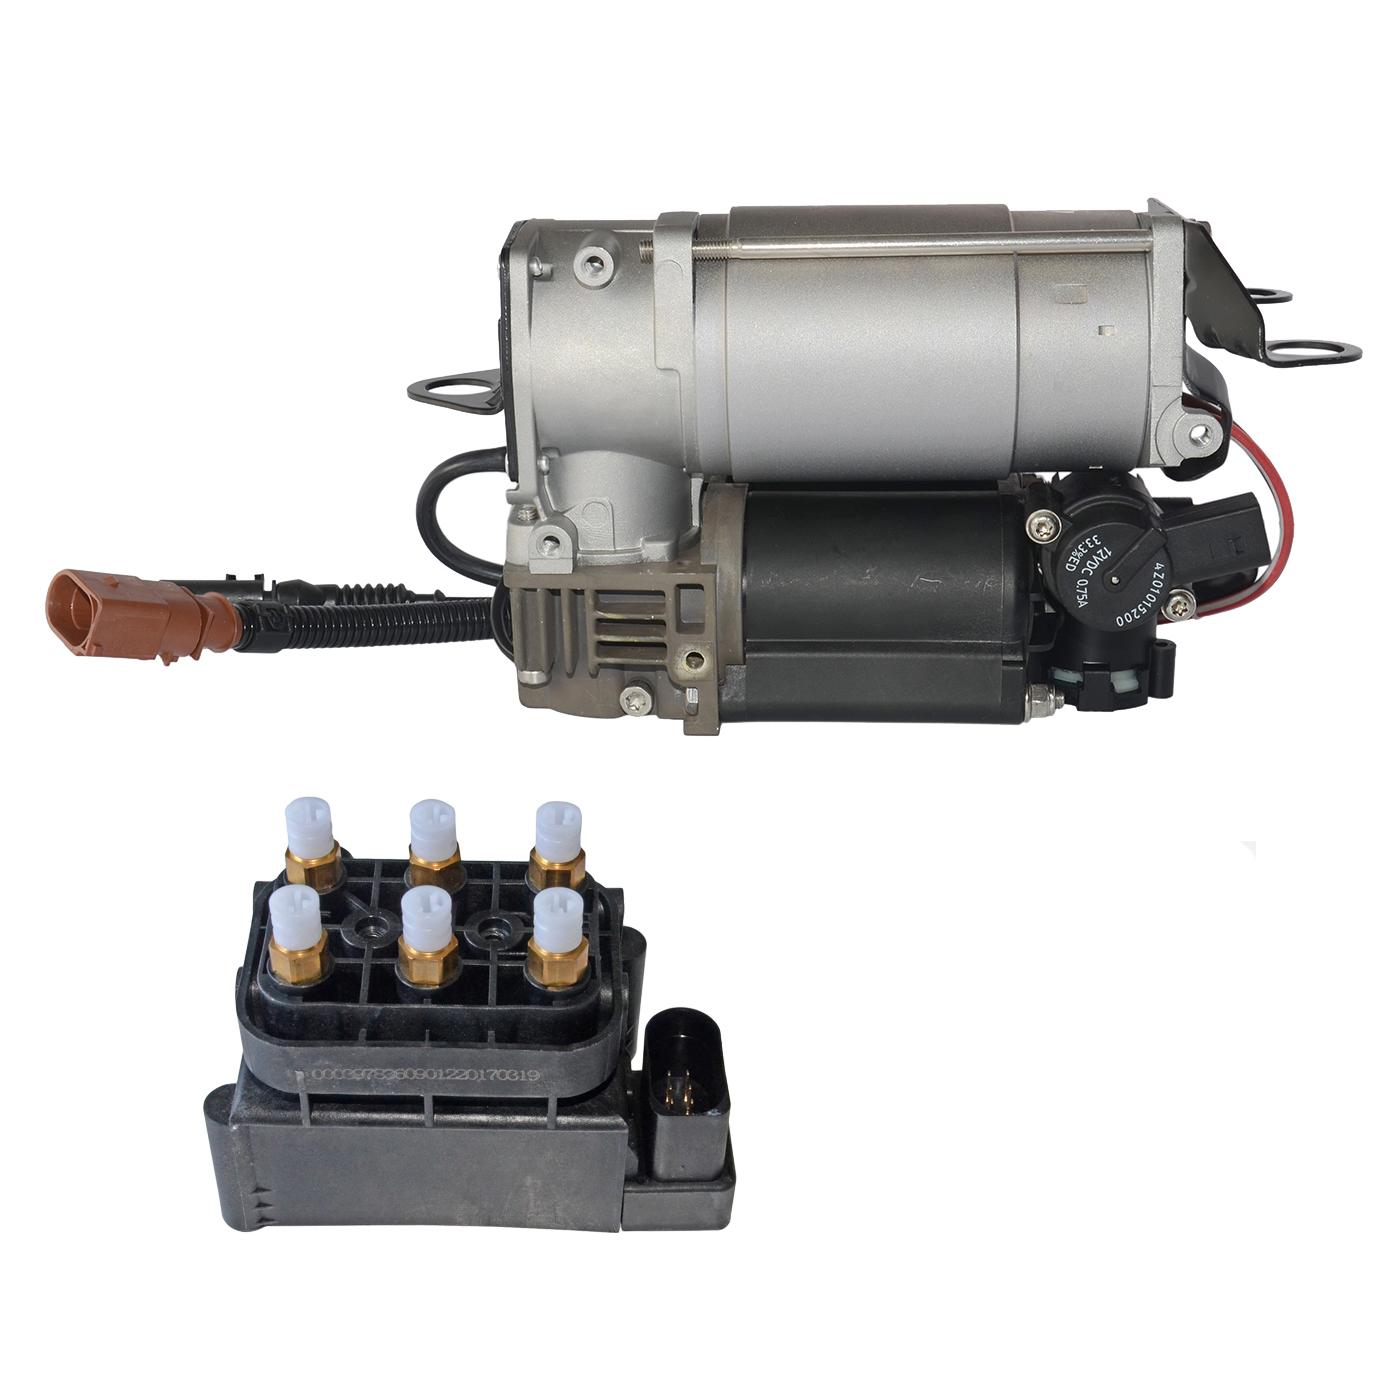 Kompressor /& Luftfahrwerk Ventilblock 4F0616006A Für Audi A6//S6 Avant Quattro C6